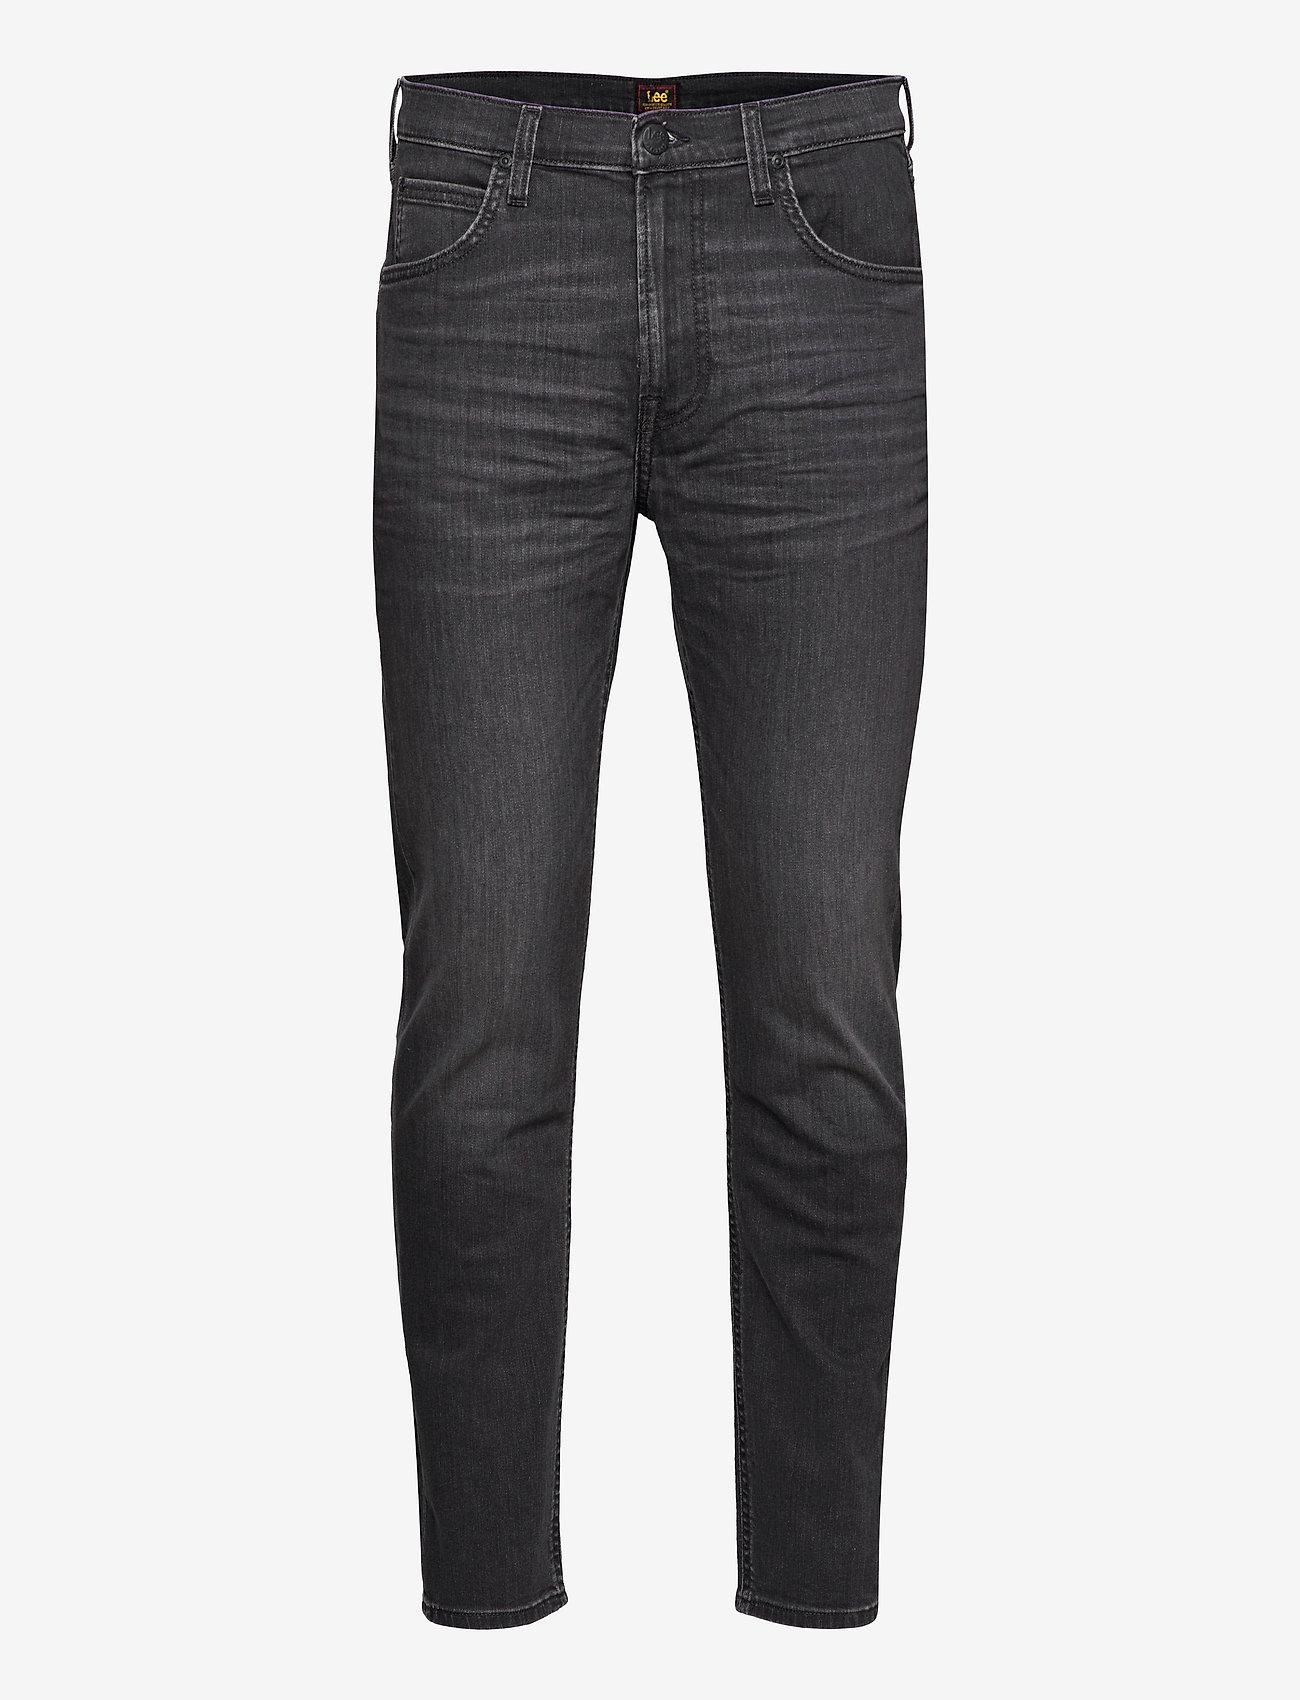 Lee Jeans - AUSTIN - tapered jeans - dark crosby - 0